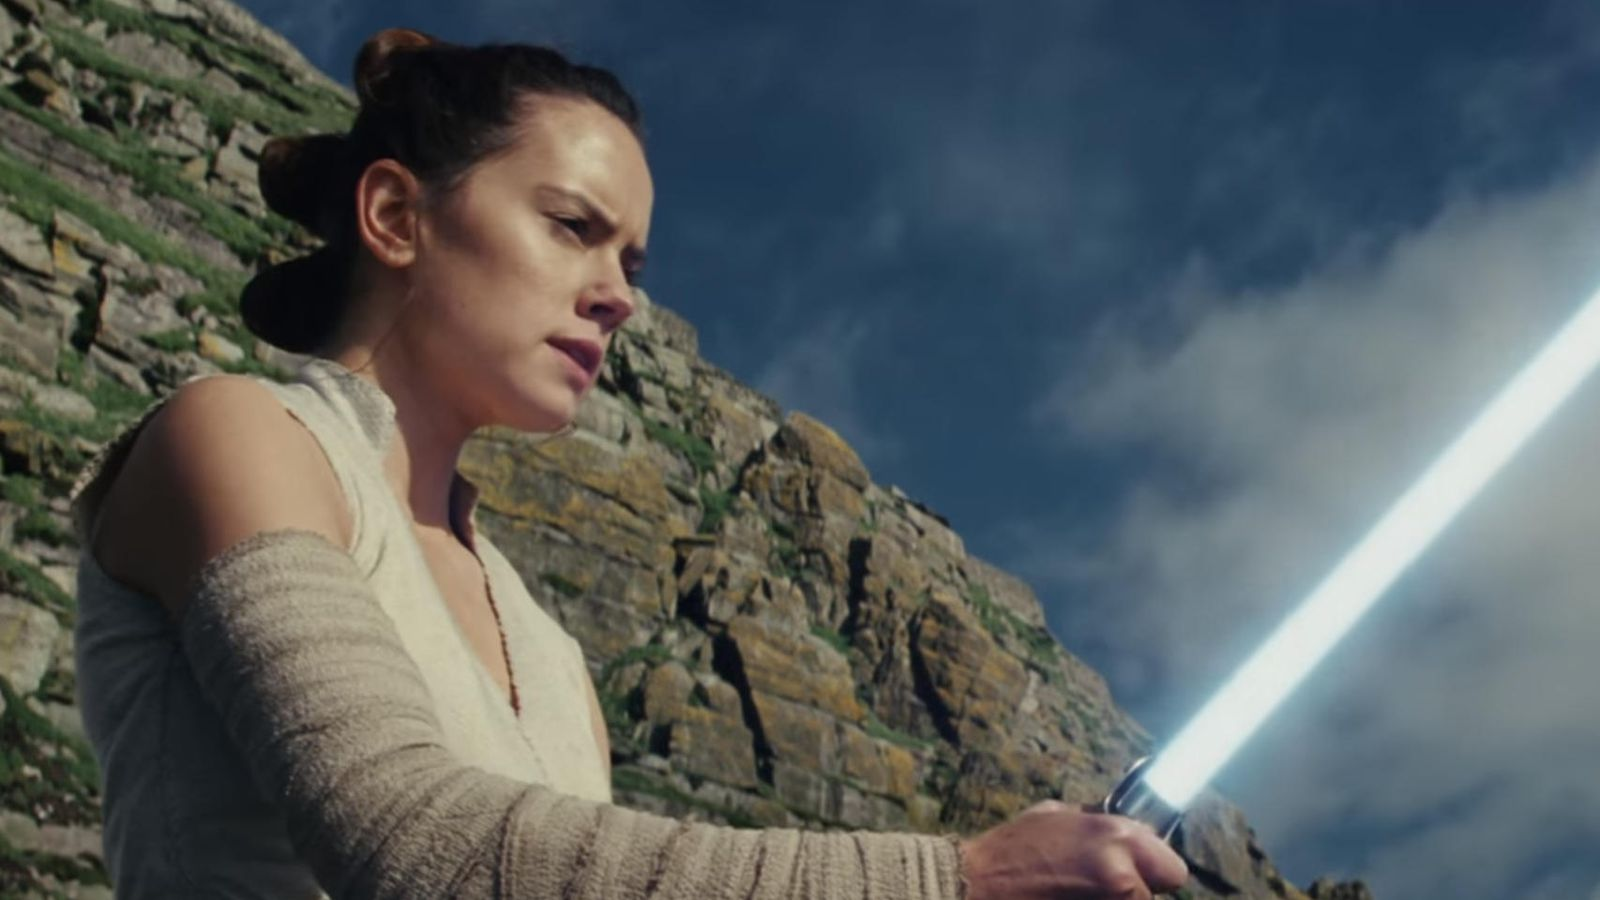 Rey Star Wars Episode IX Theory